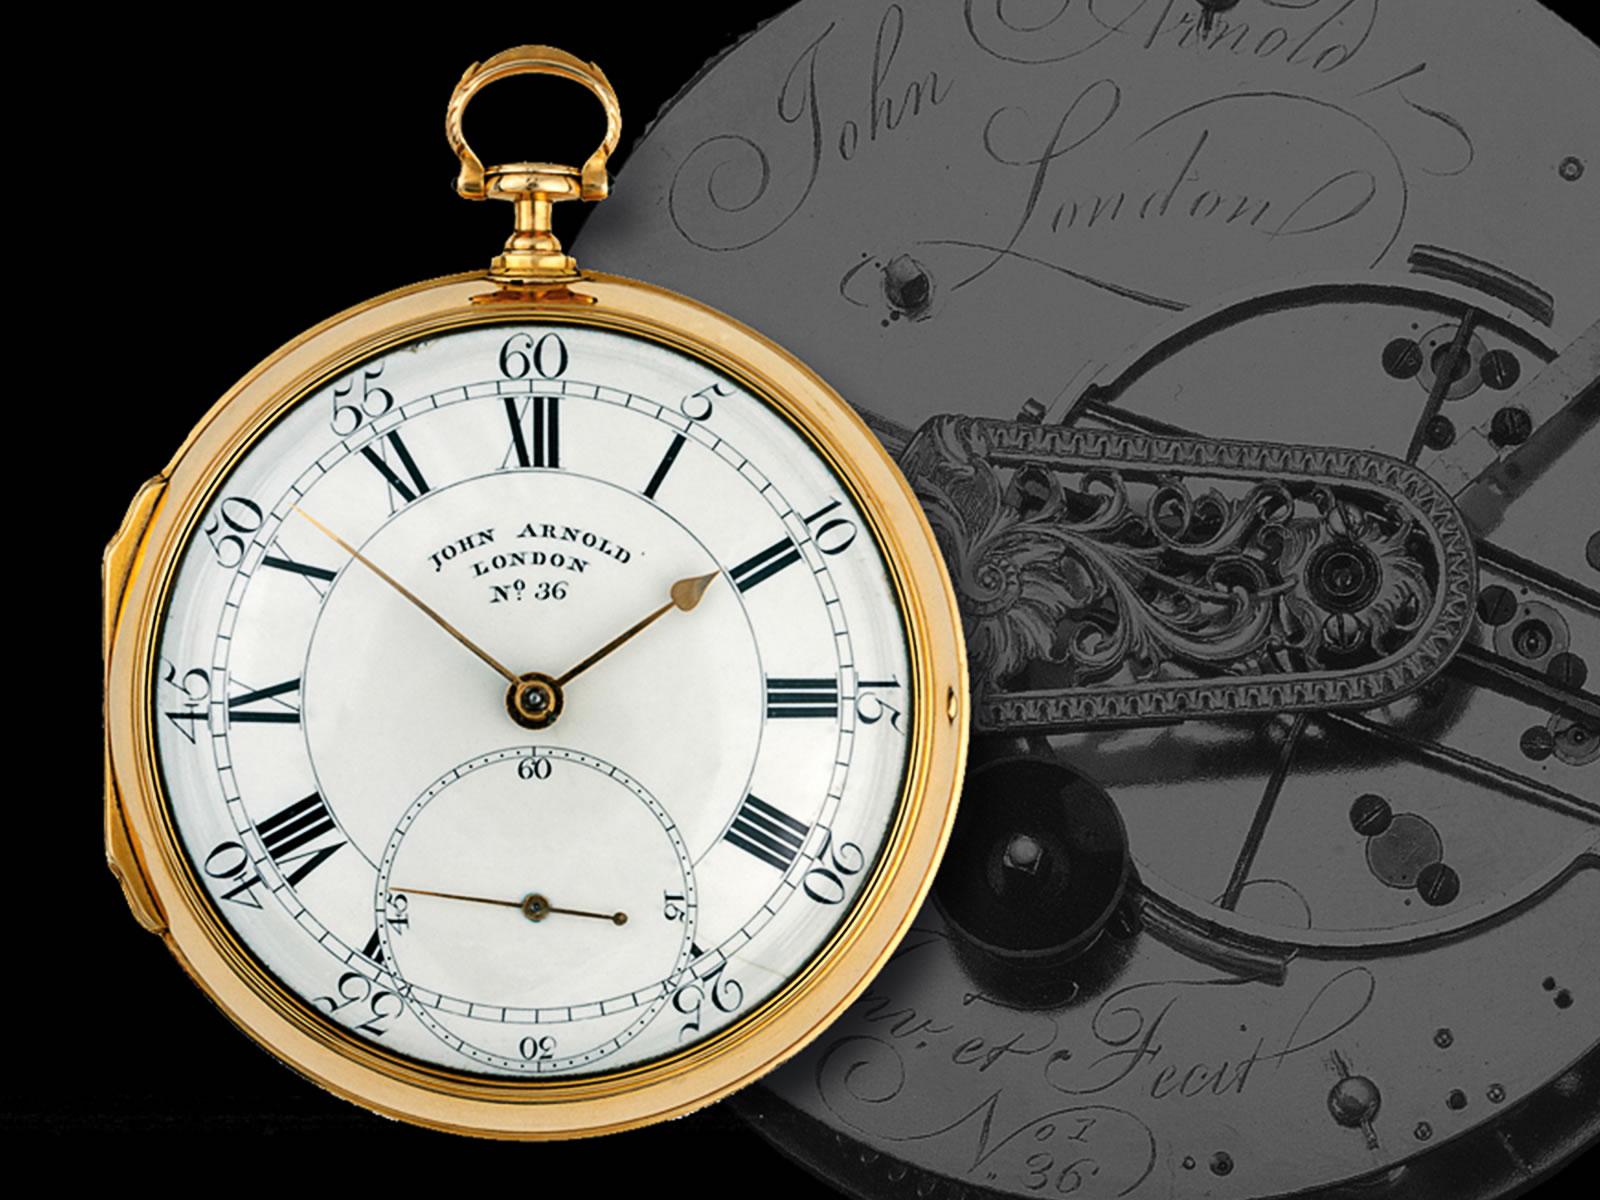 john-arnold-pocket-chronometer-no-1-36-1778-2.jpg